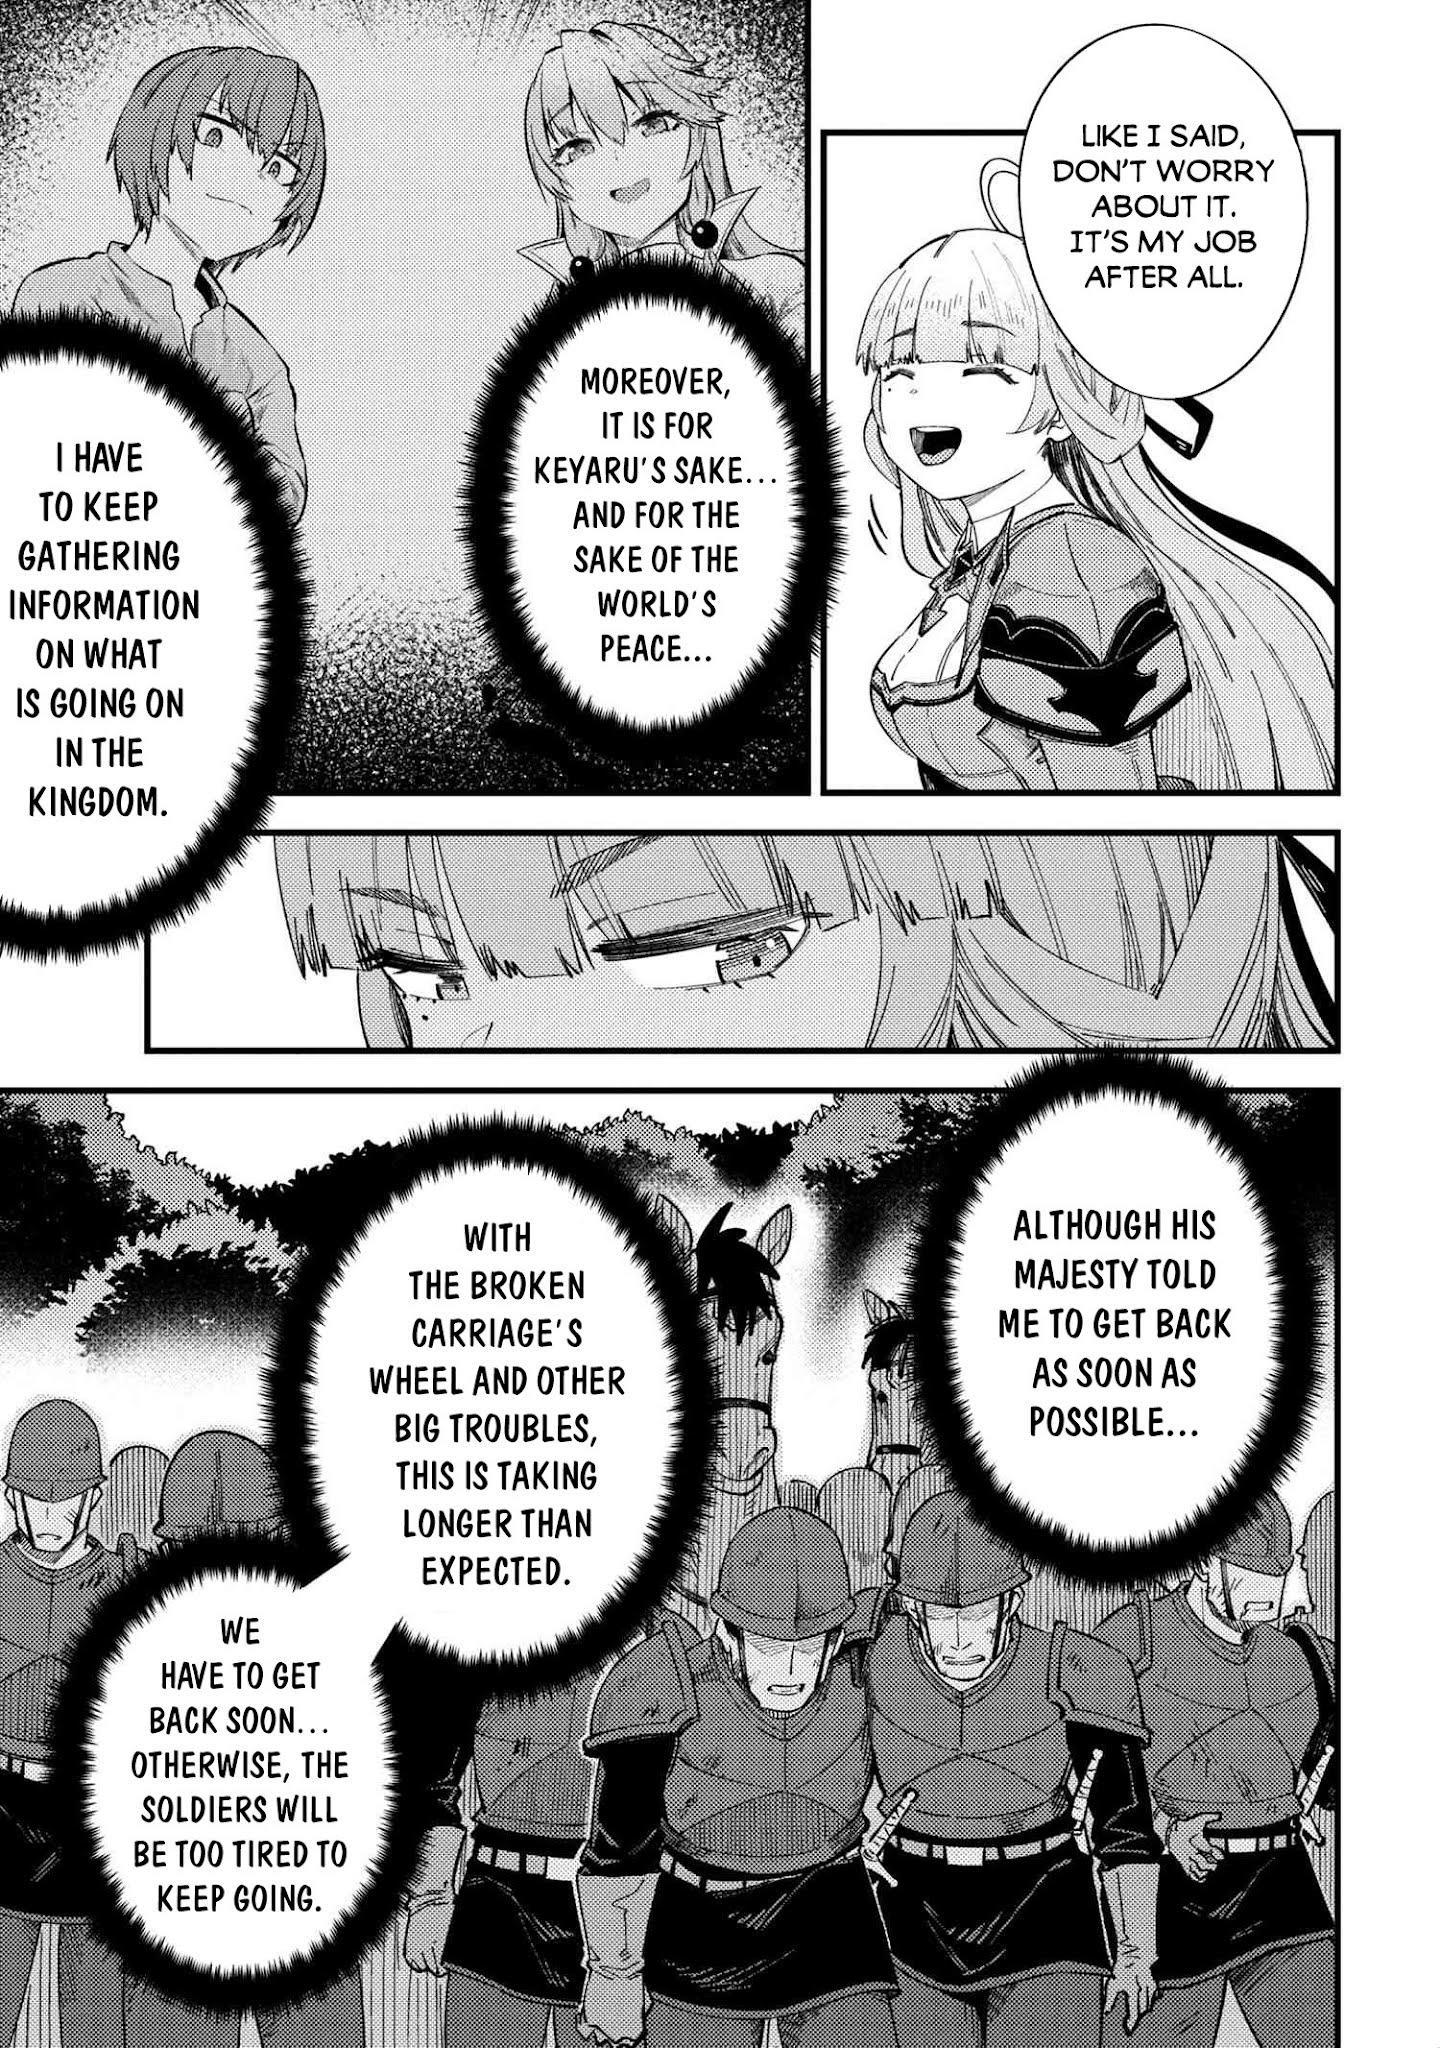 Kaifuku Jutsushi No Yarinaoshi Chapter 38.2 page 4 - Mangakakalot